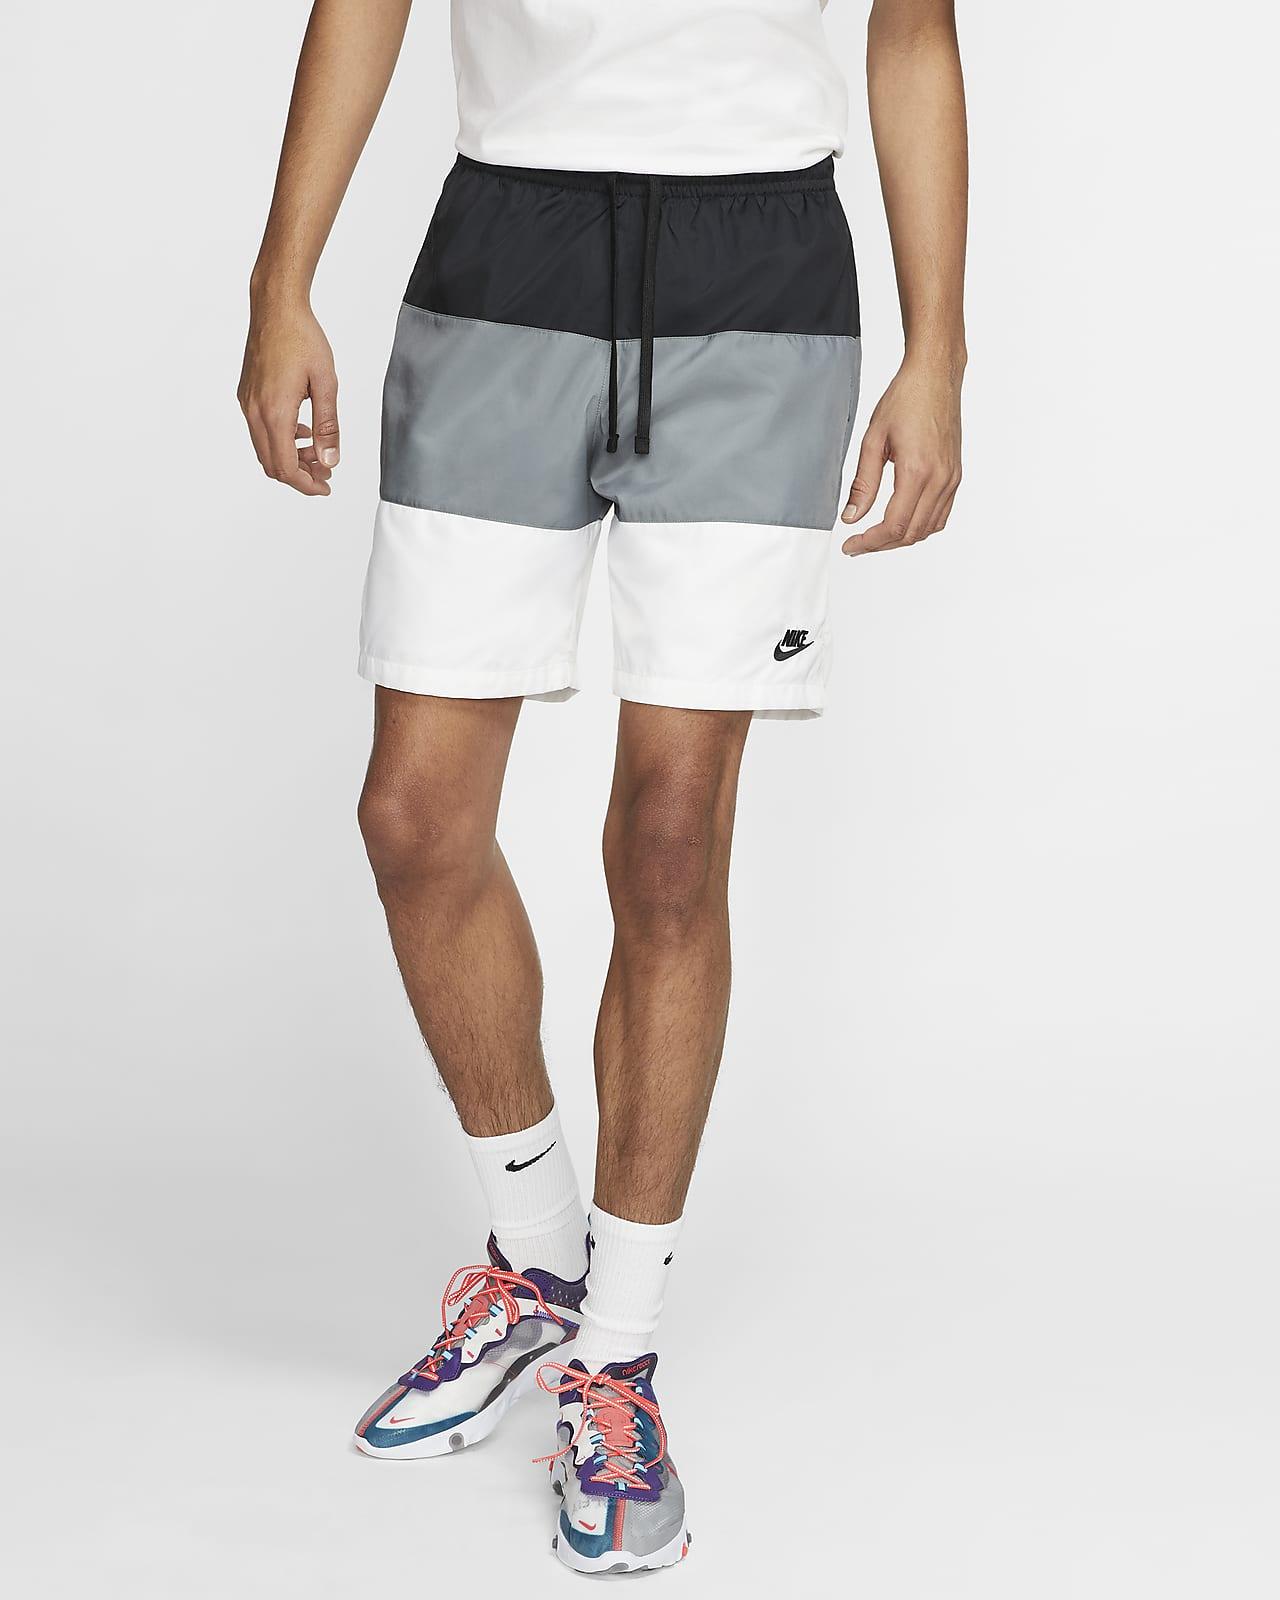 Nike Sportswear City Edition vevd shorts til herre